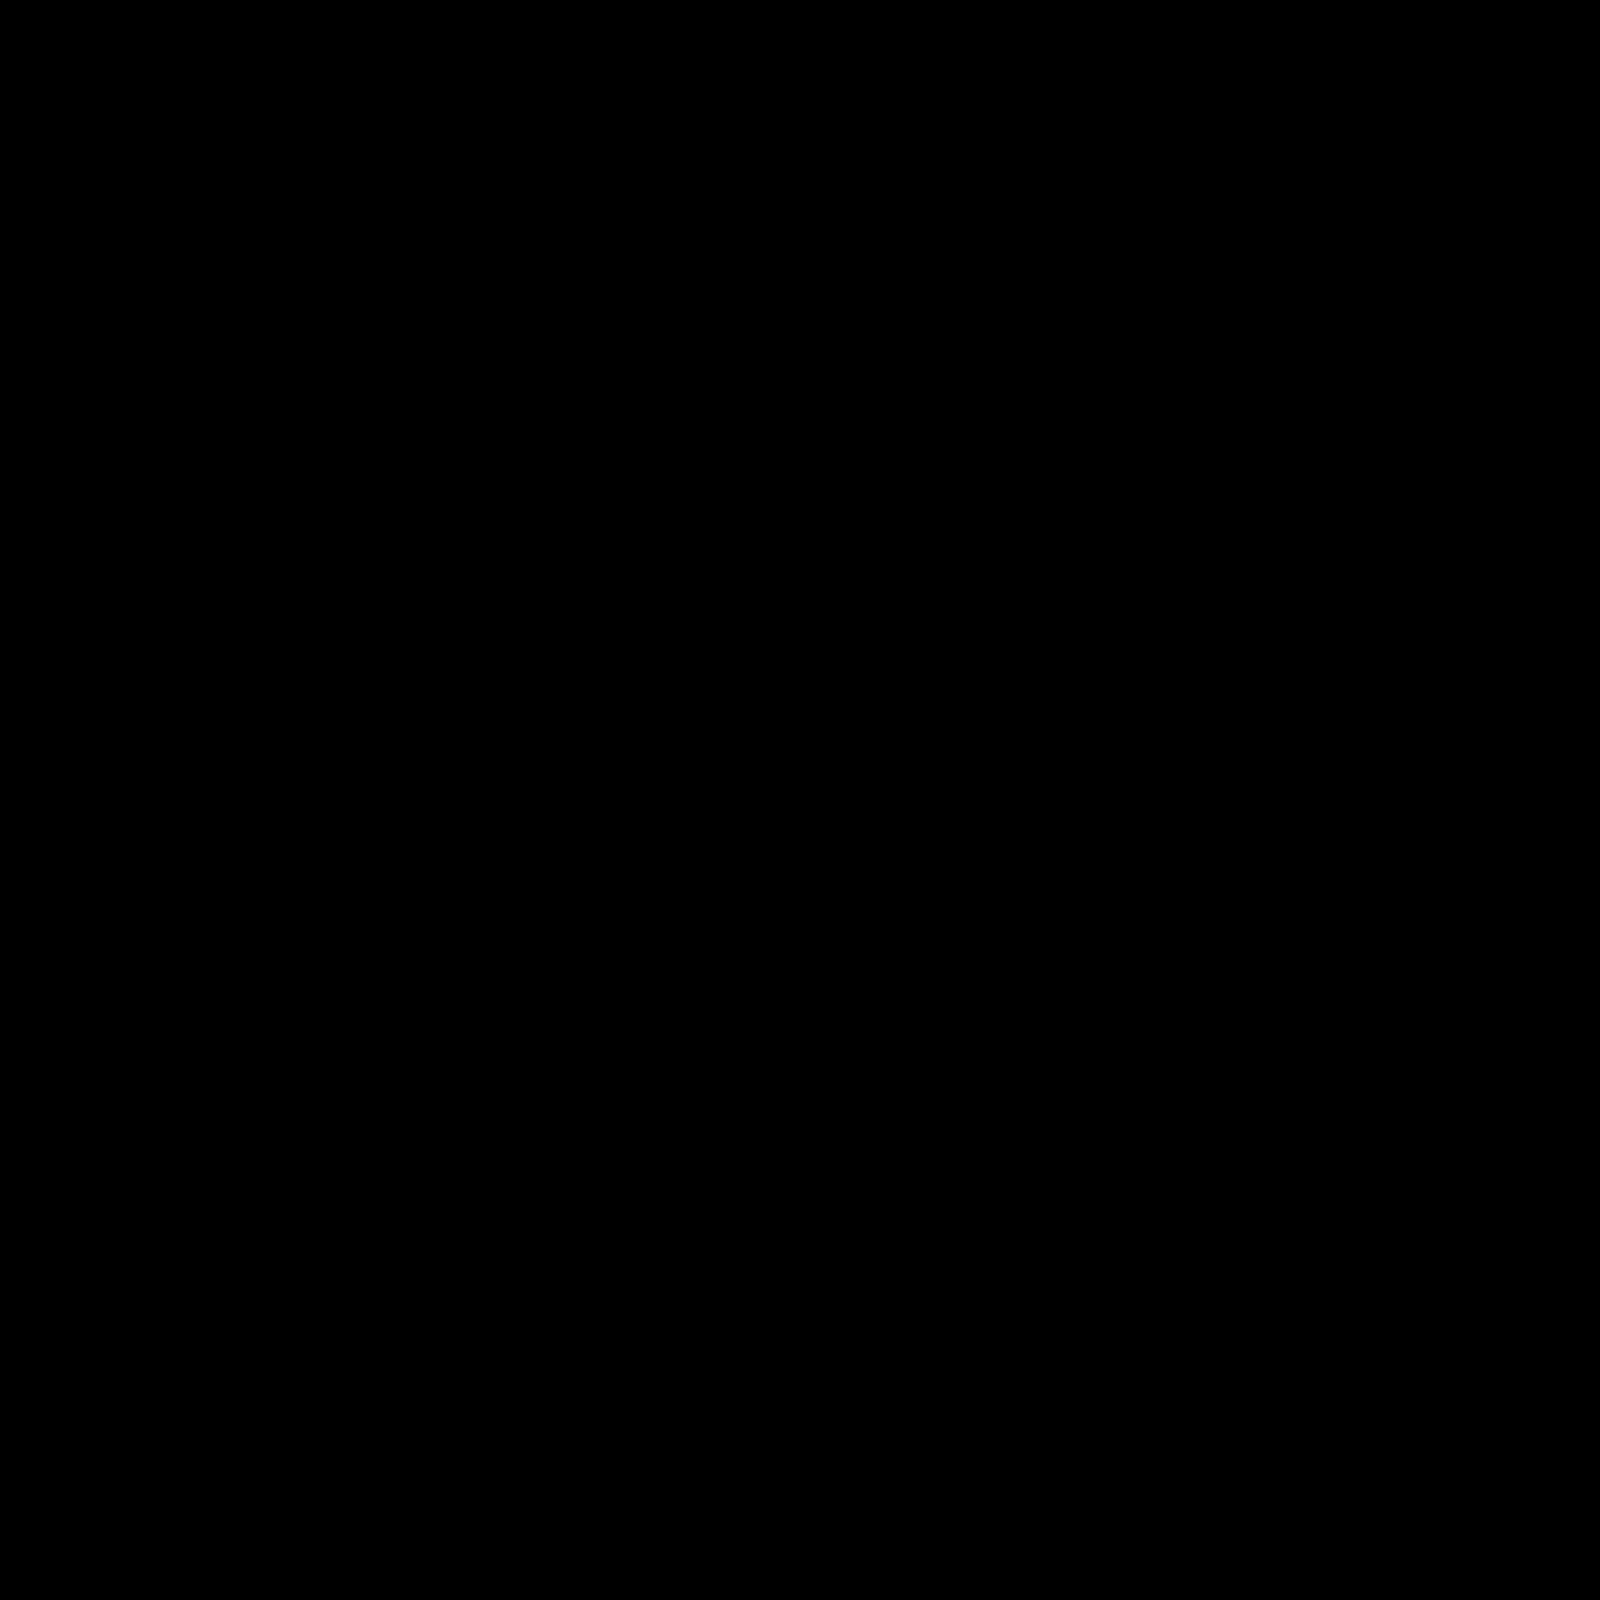 Хулиган icon